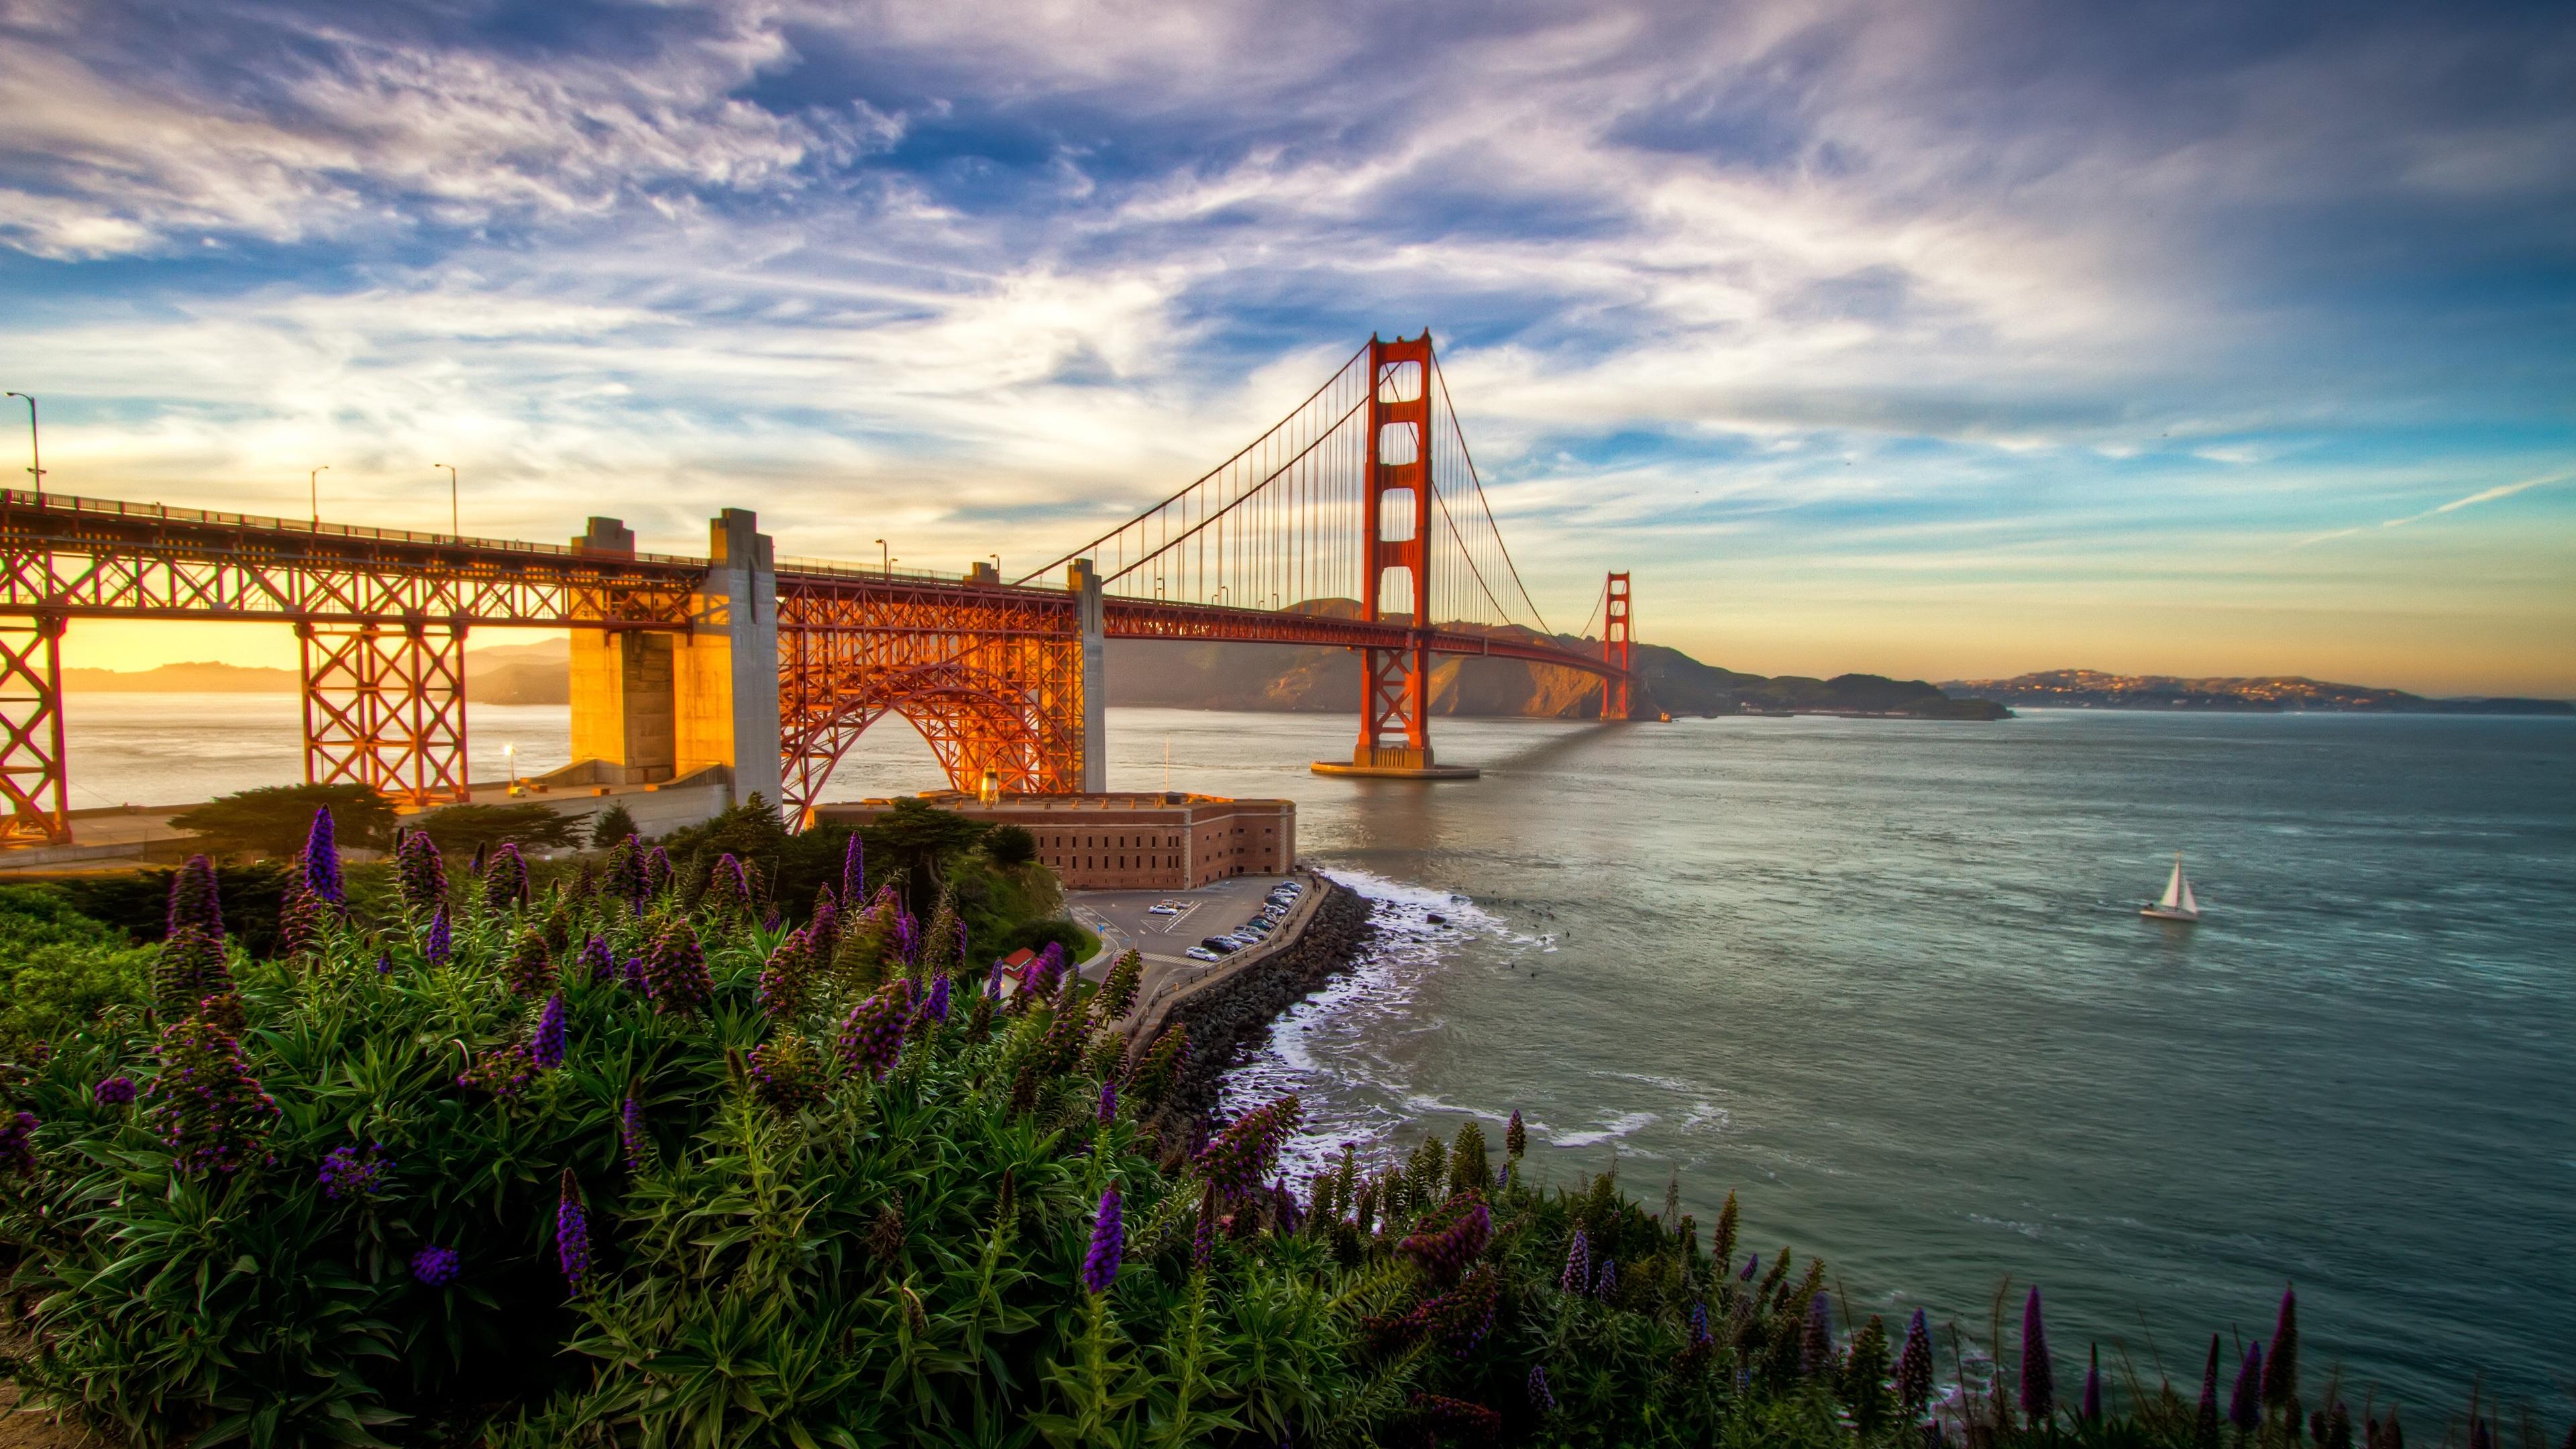 Fondos De Pantalla San Francisco Puente Mar California